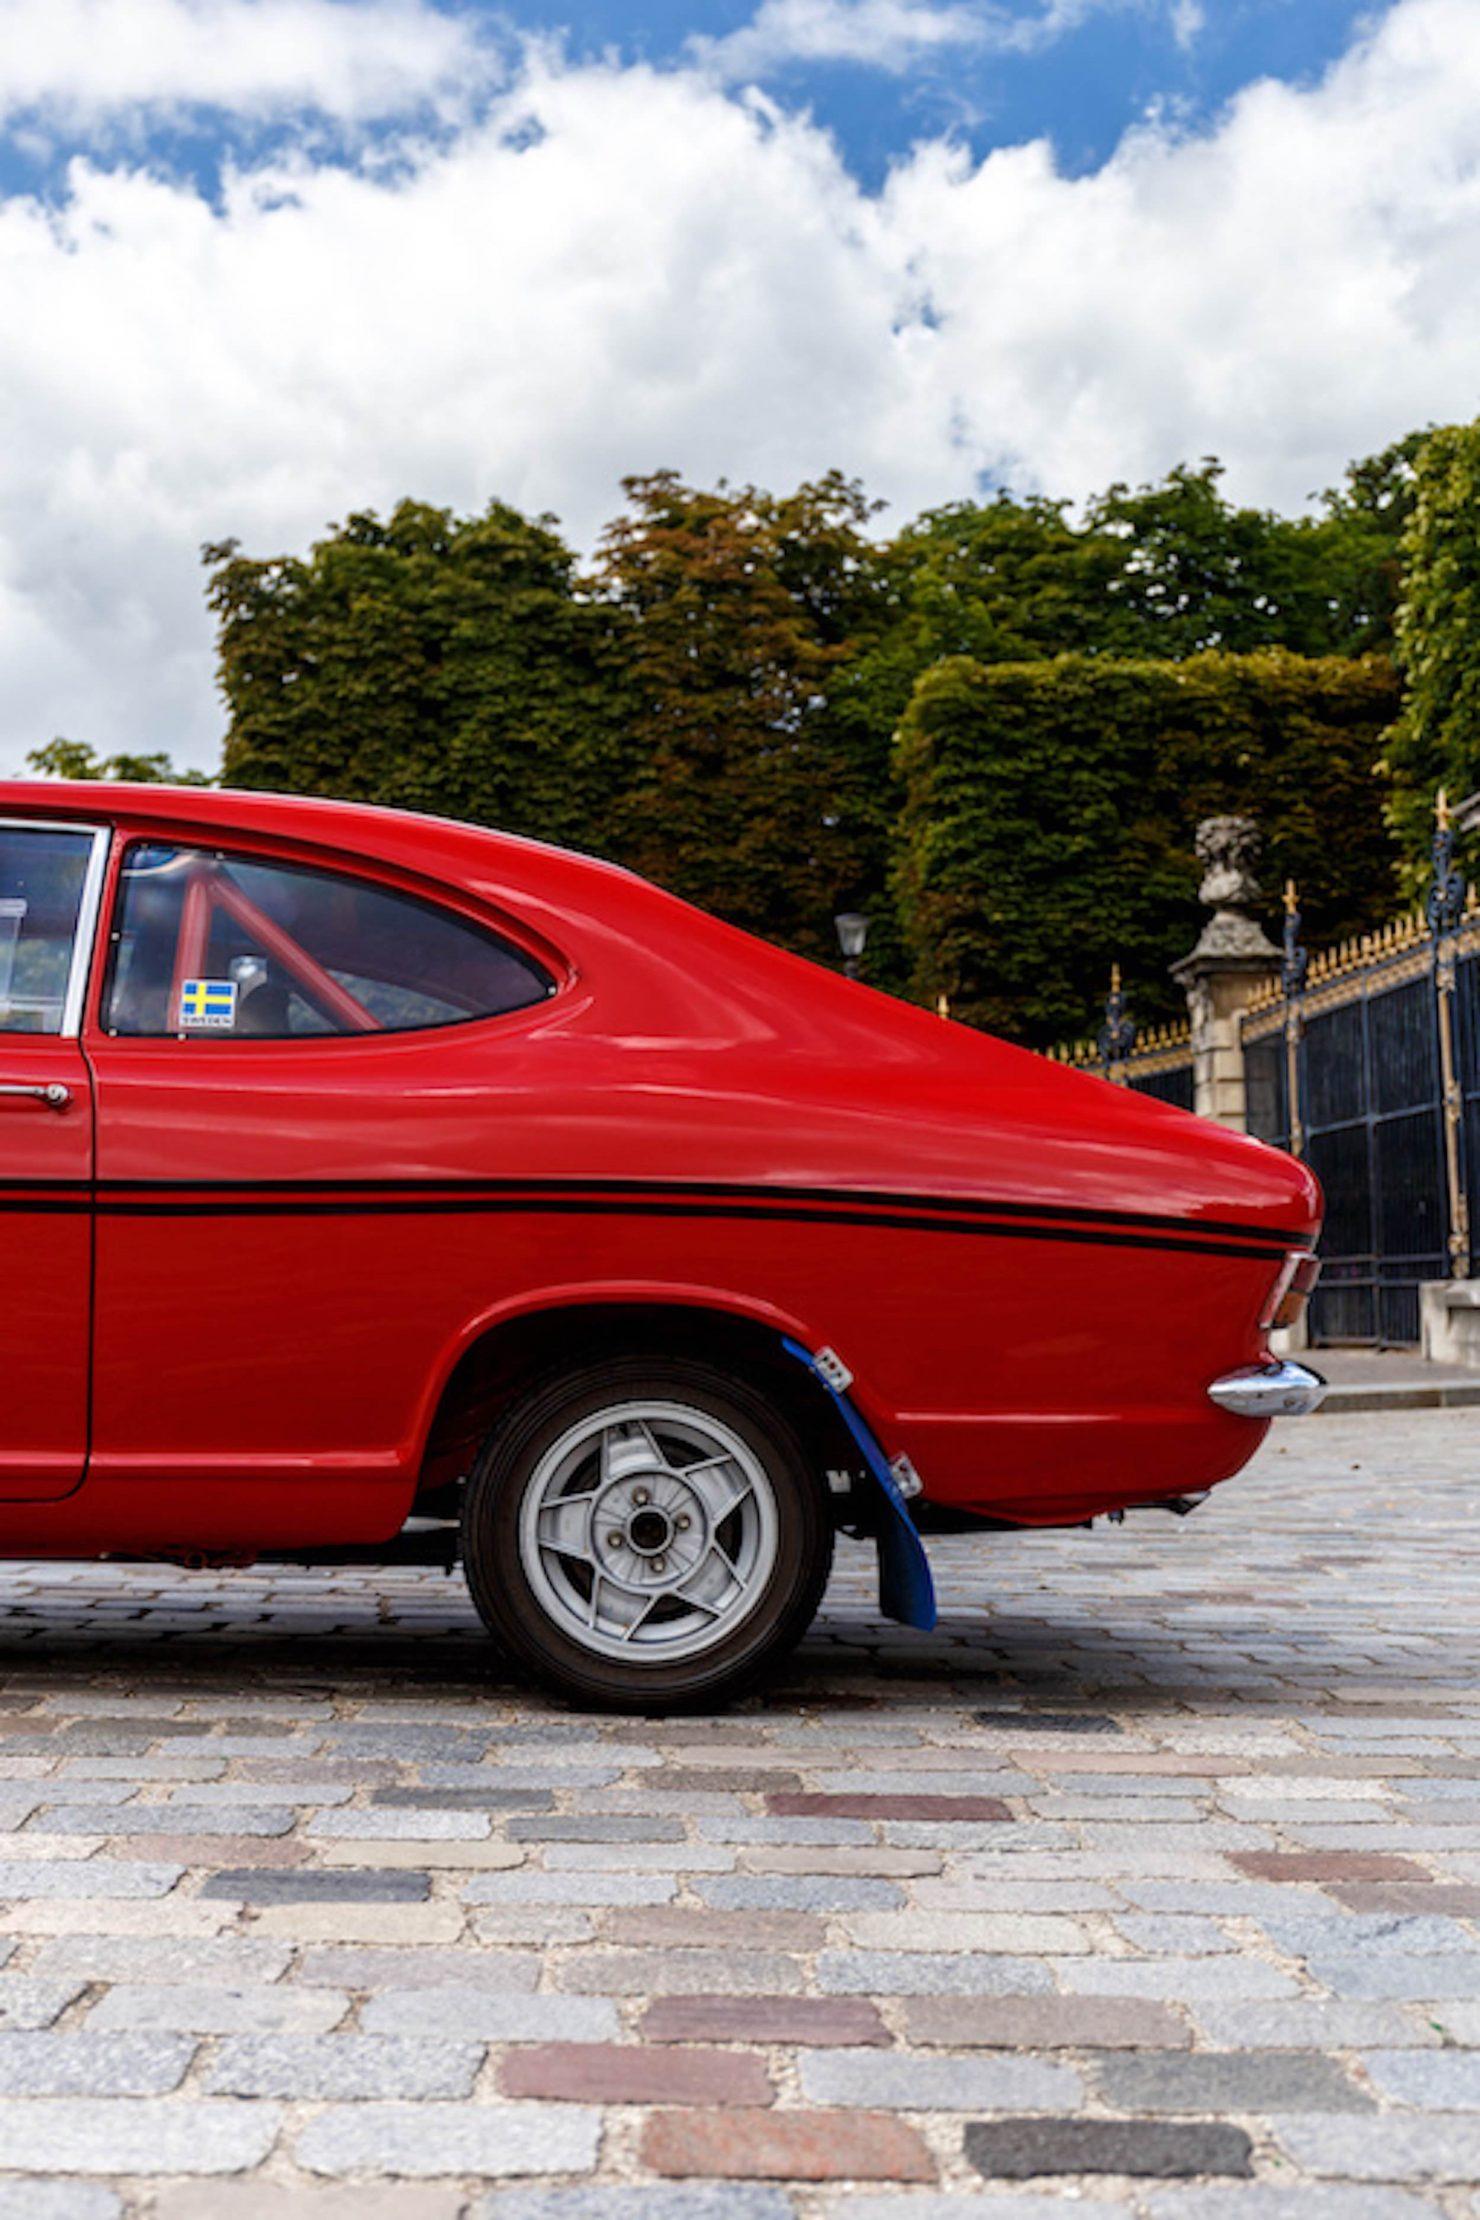 opel kadett rallye car 10 1480x2220 - 1969 Opel Rallye Kadett